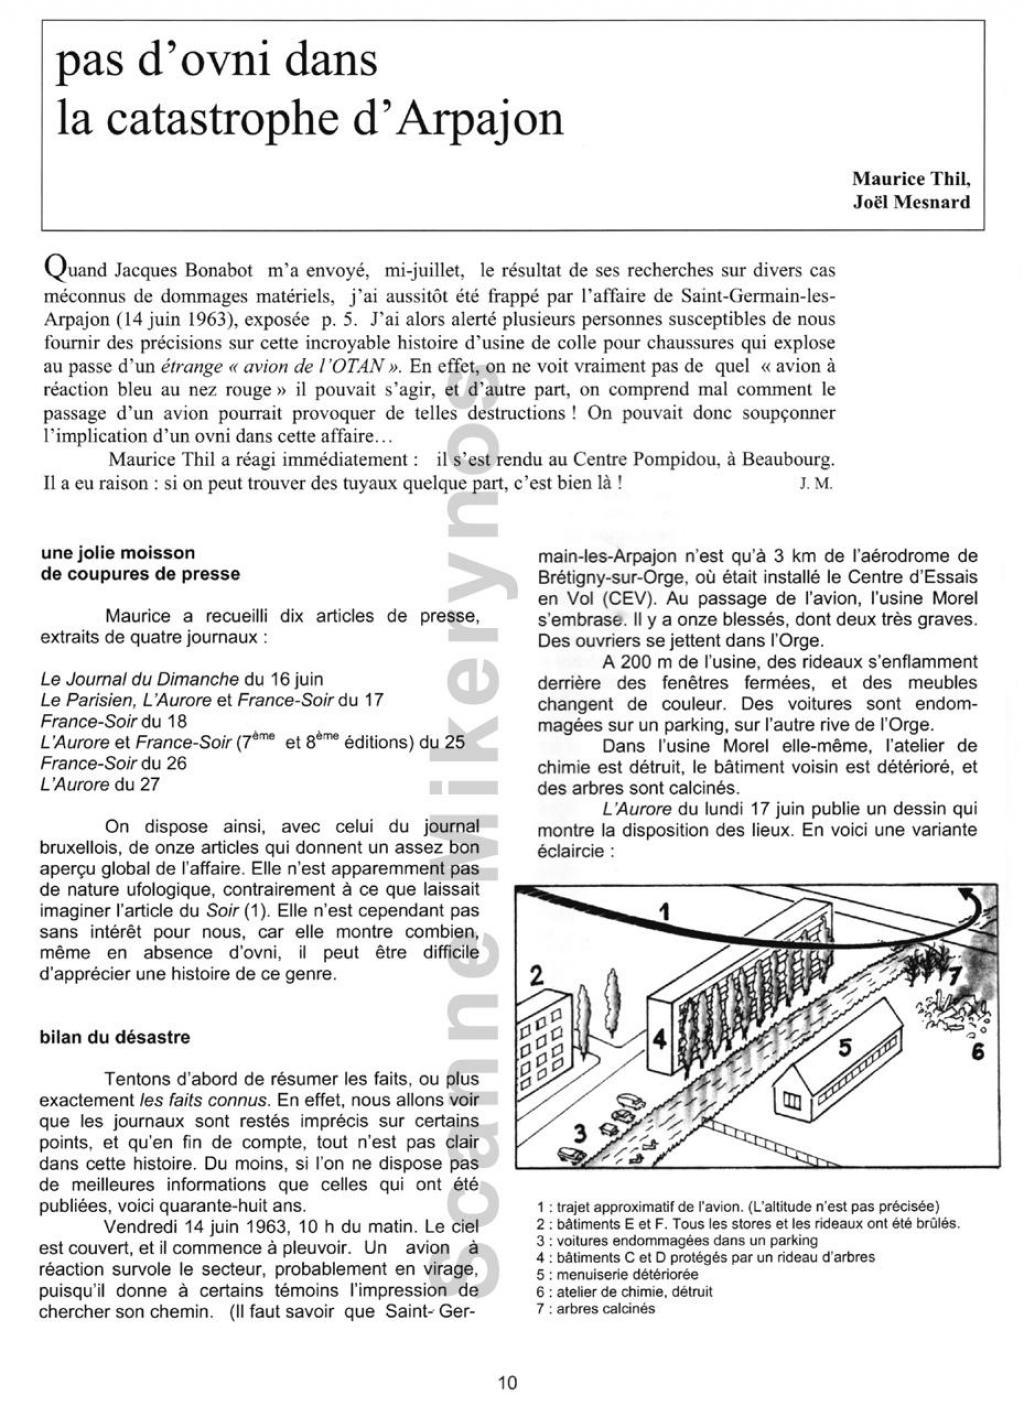 Saint Germain les Arpajon  - Le 14 Juin 1963 Fr10-30954ea